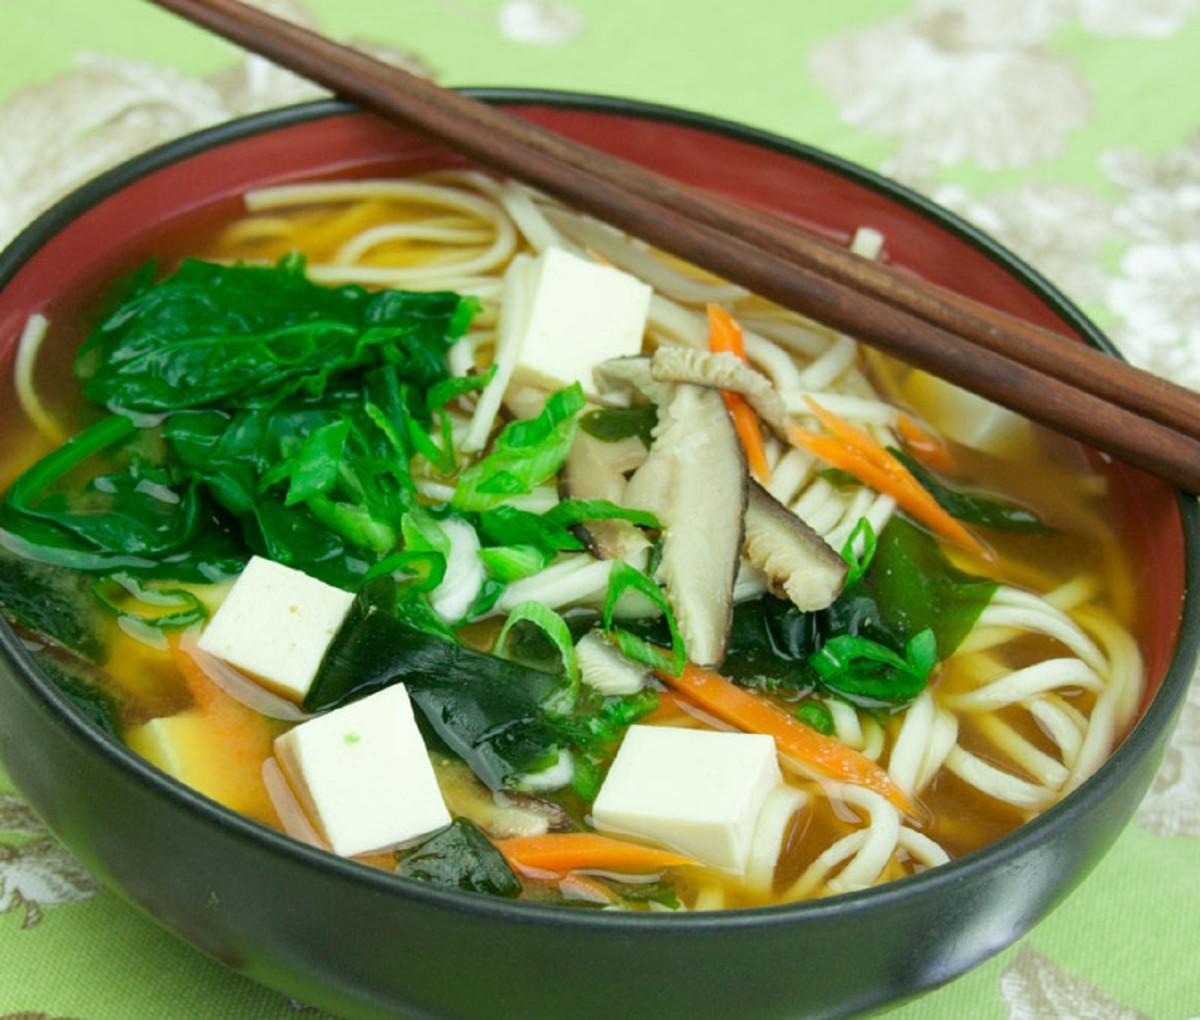 Blue apron udon miso - Udon Miso Soup Joy Of Kosher Udon Miso Soupjpg Udon Miso Soup